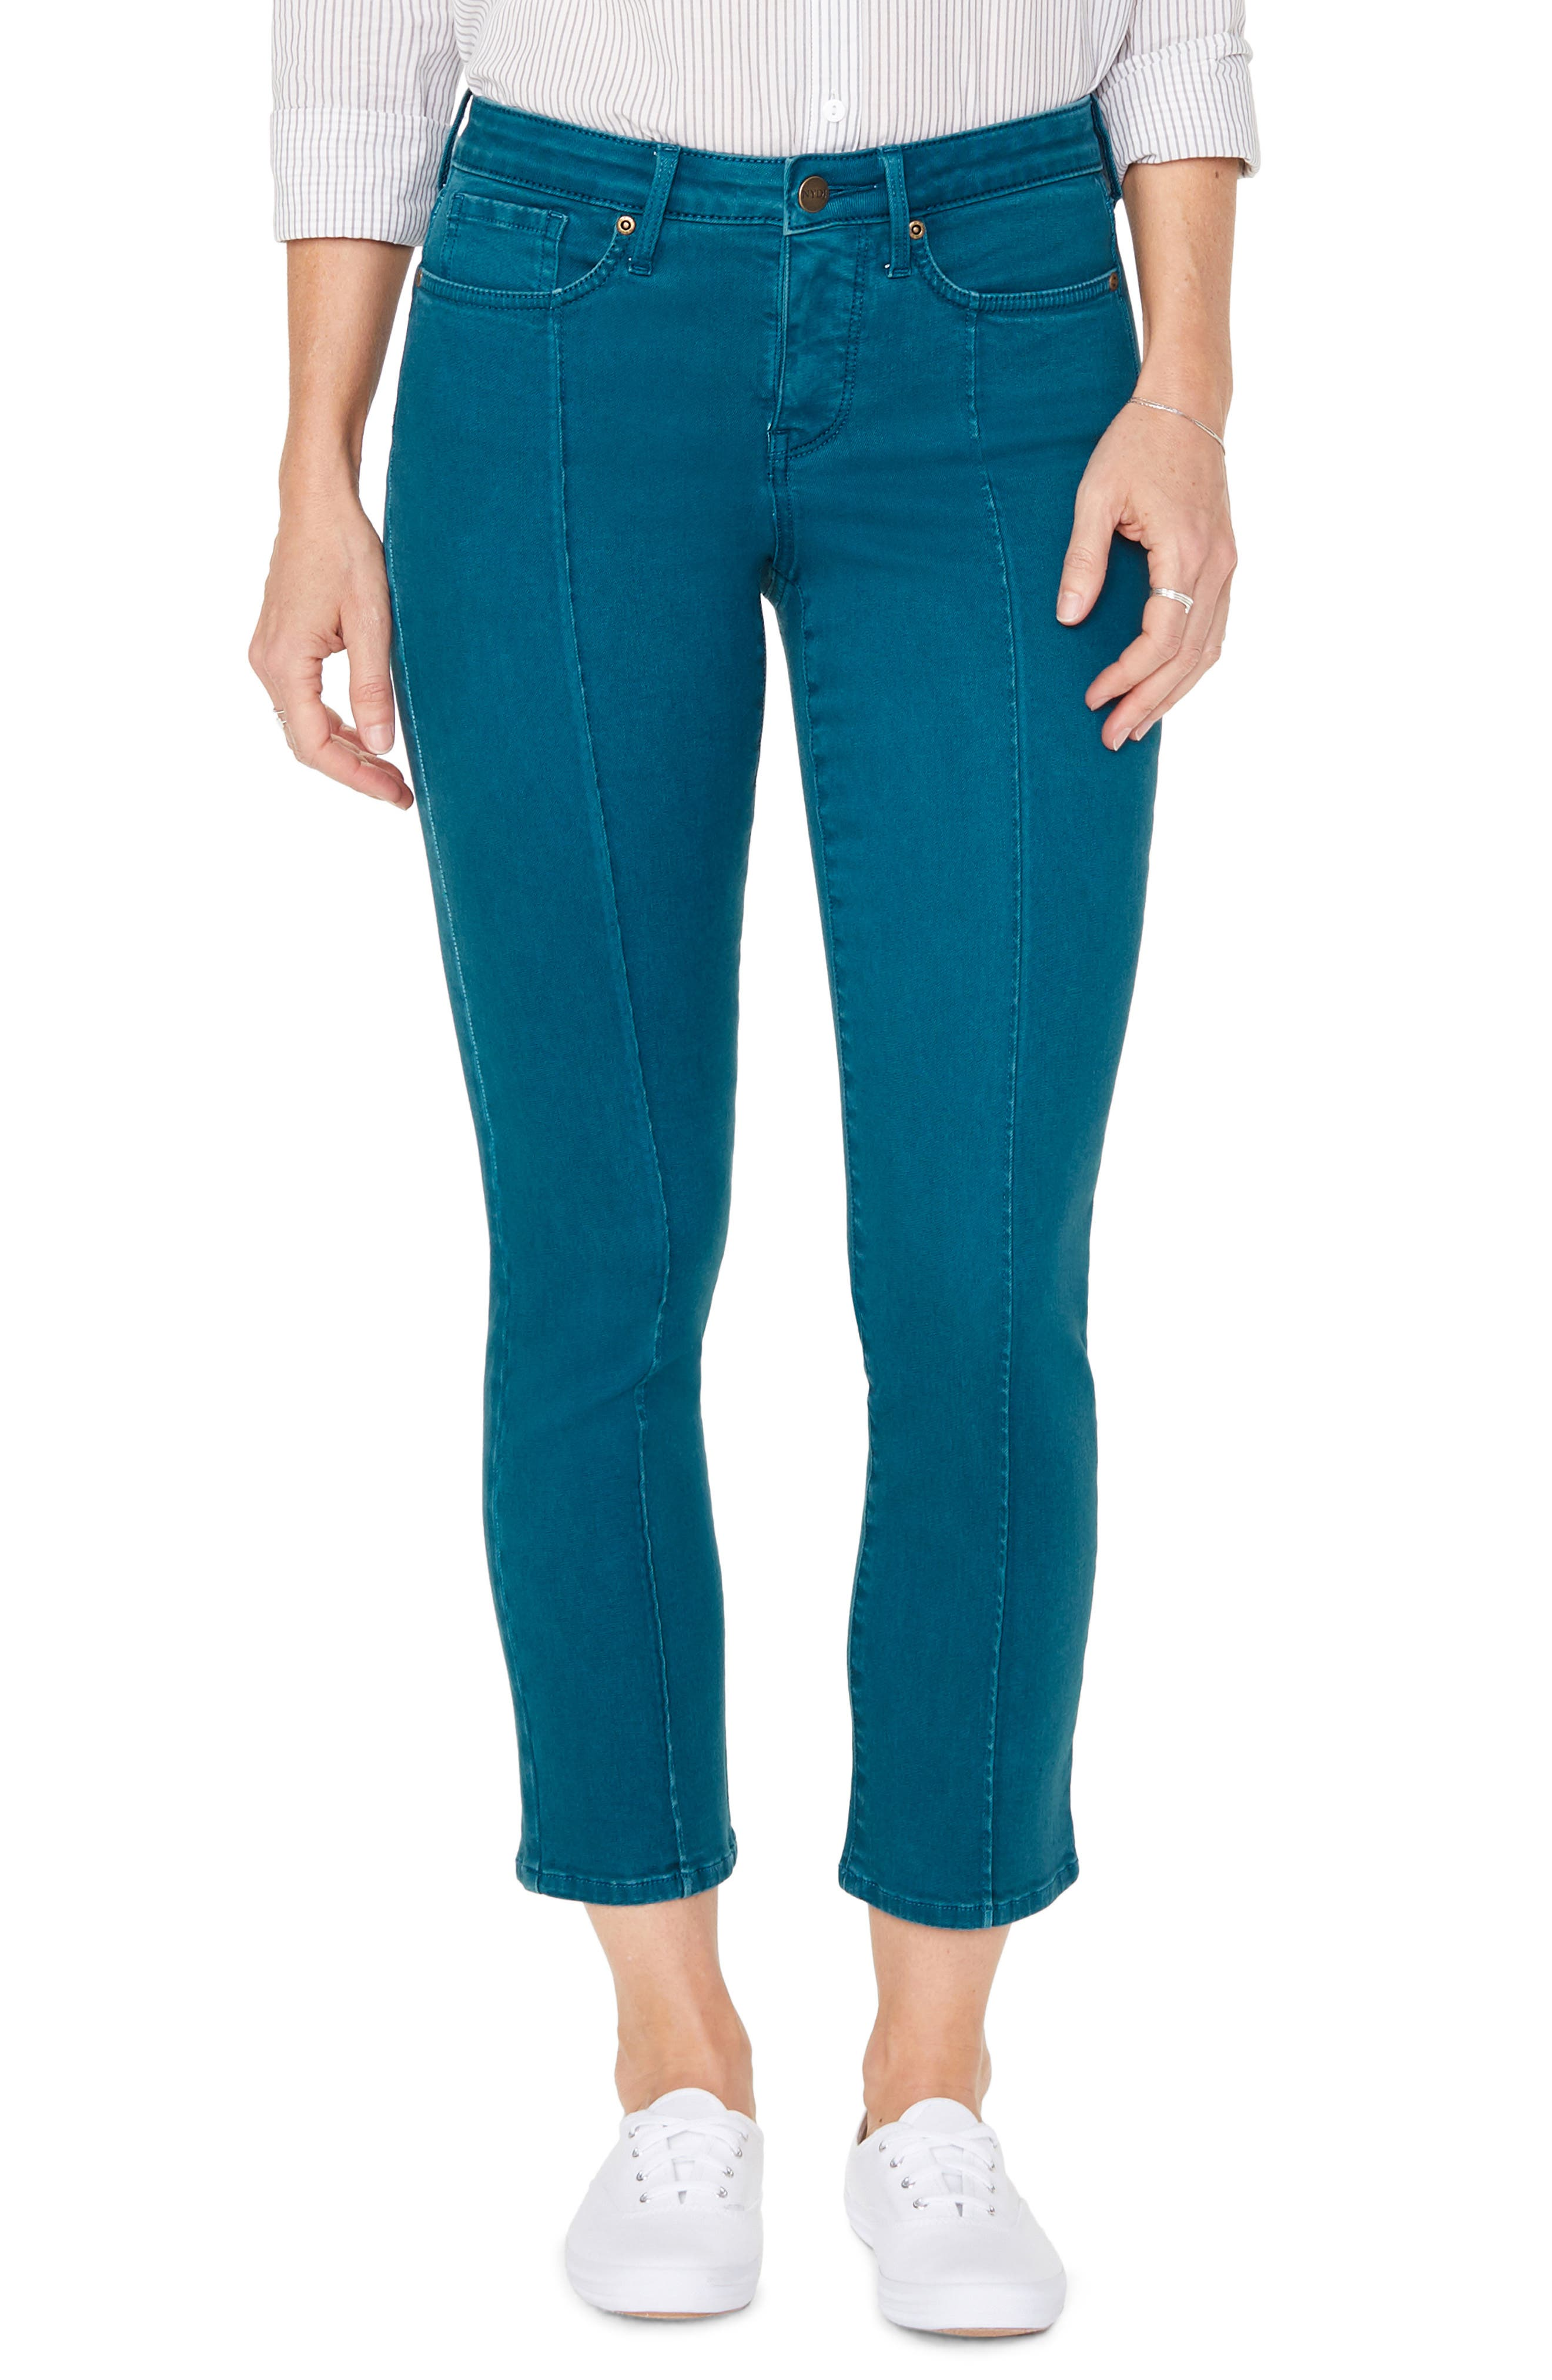 Image of NYDJ Sheri Pintuck Slim Jeans